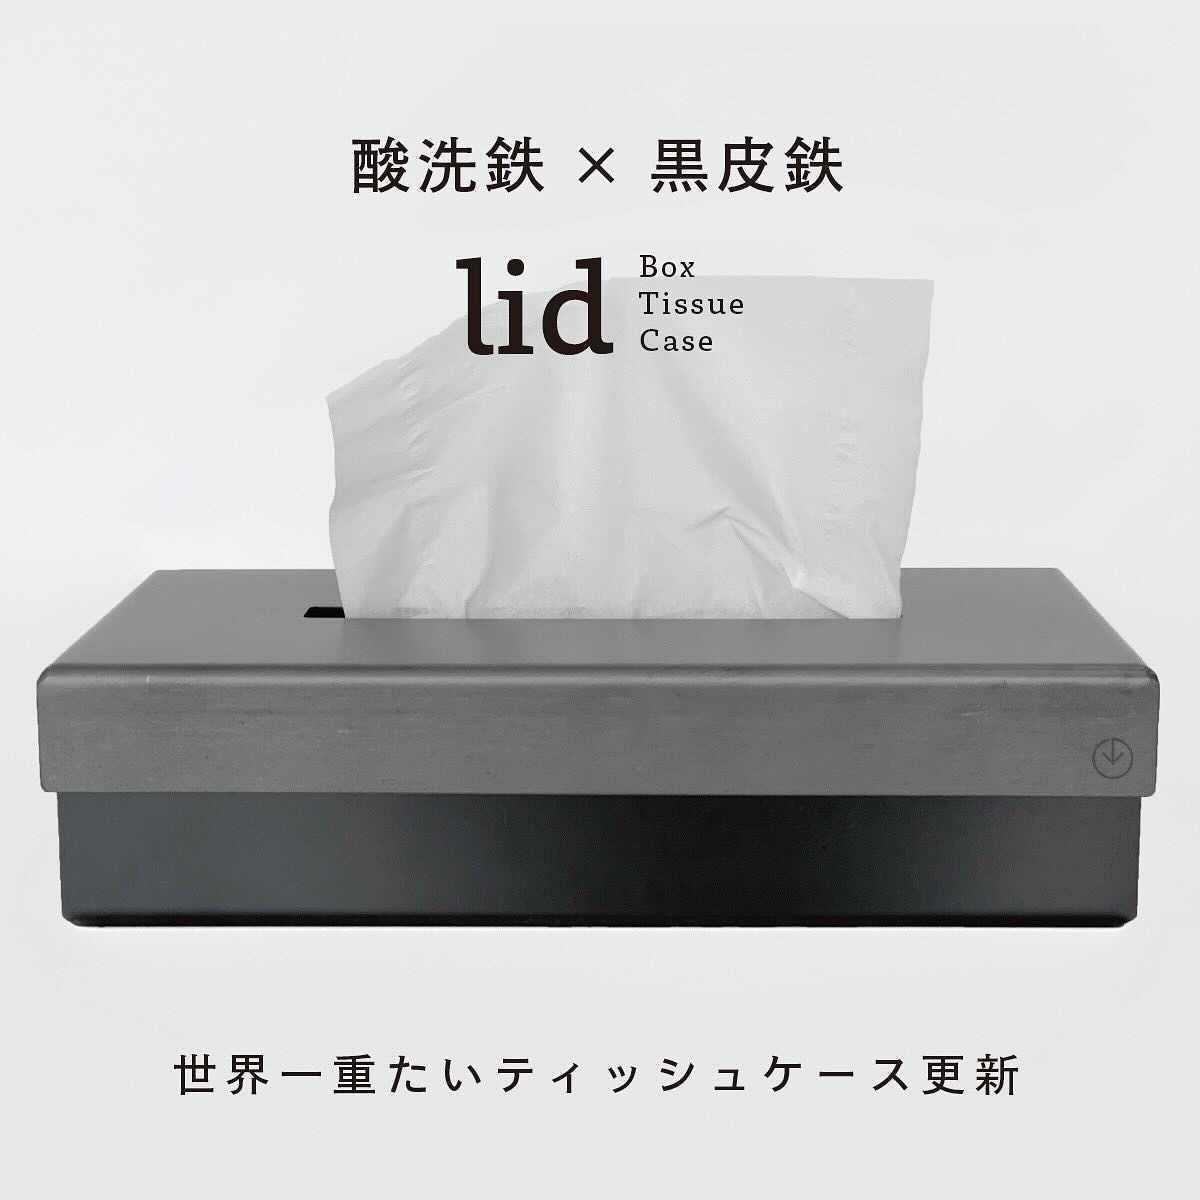 GRAVIRoN lid Box Tissue Case 酸洗鉄×黒皮鉄(ティッシュケース)